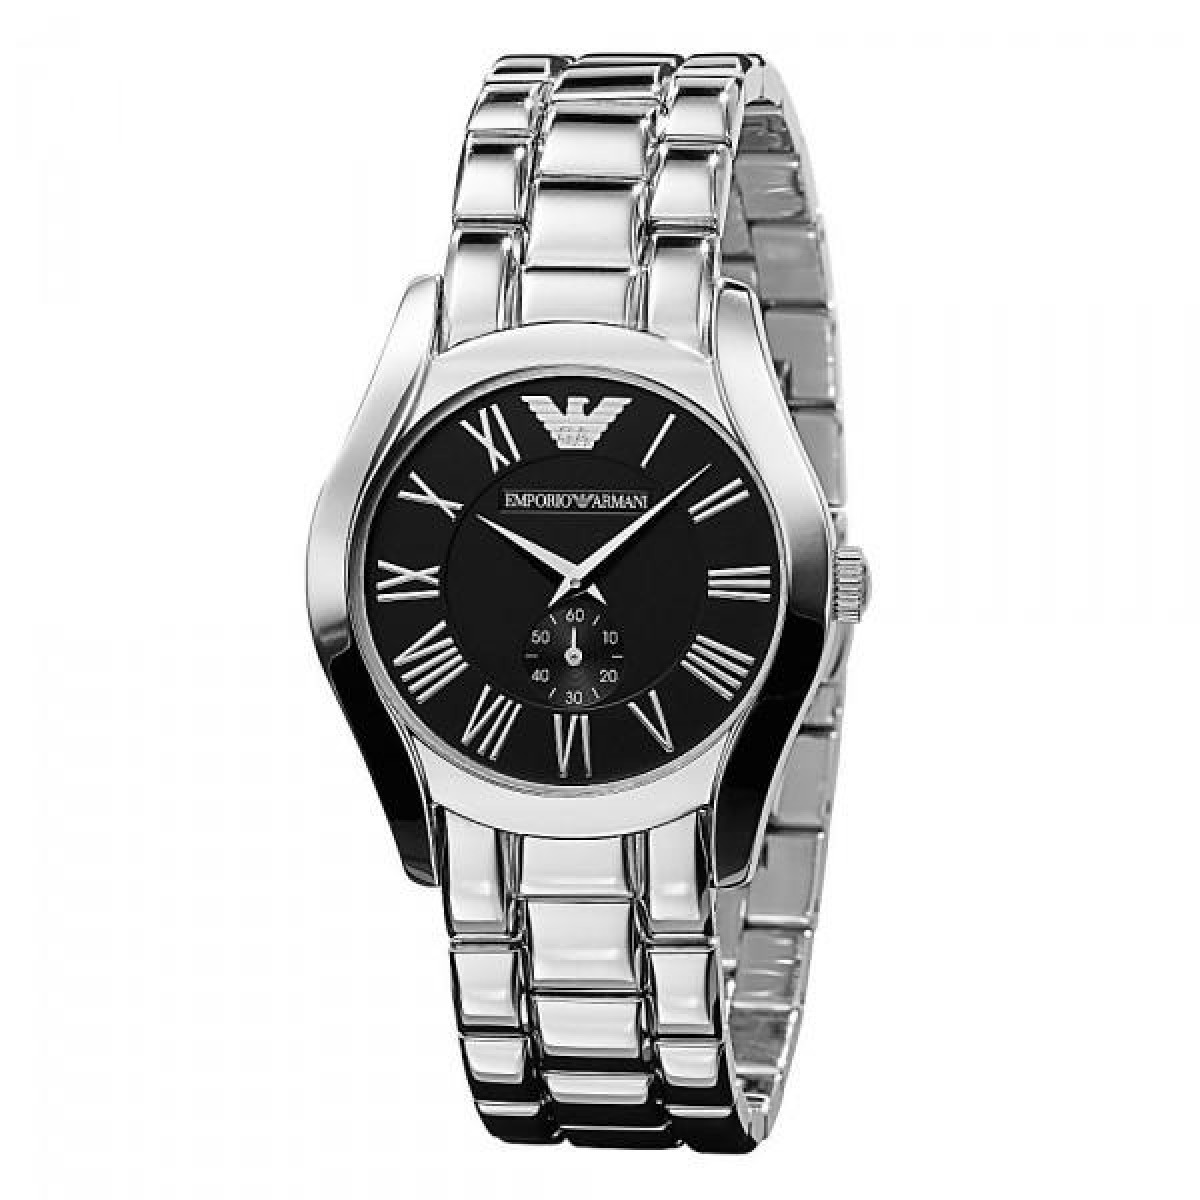 Đồng hồ Armani nữ AR0681